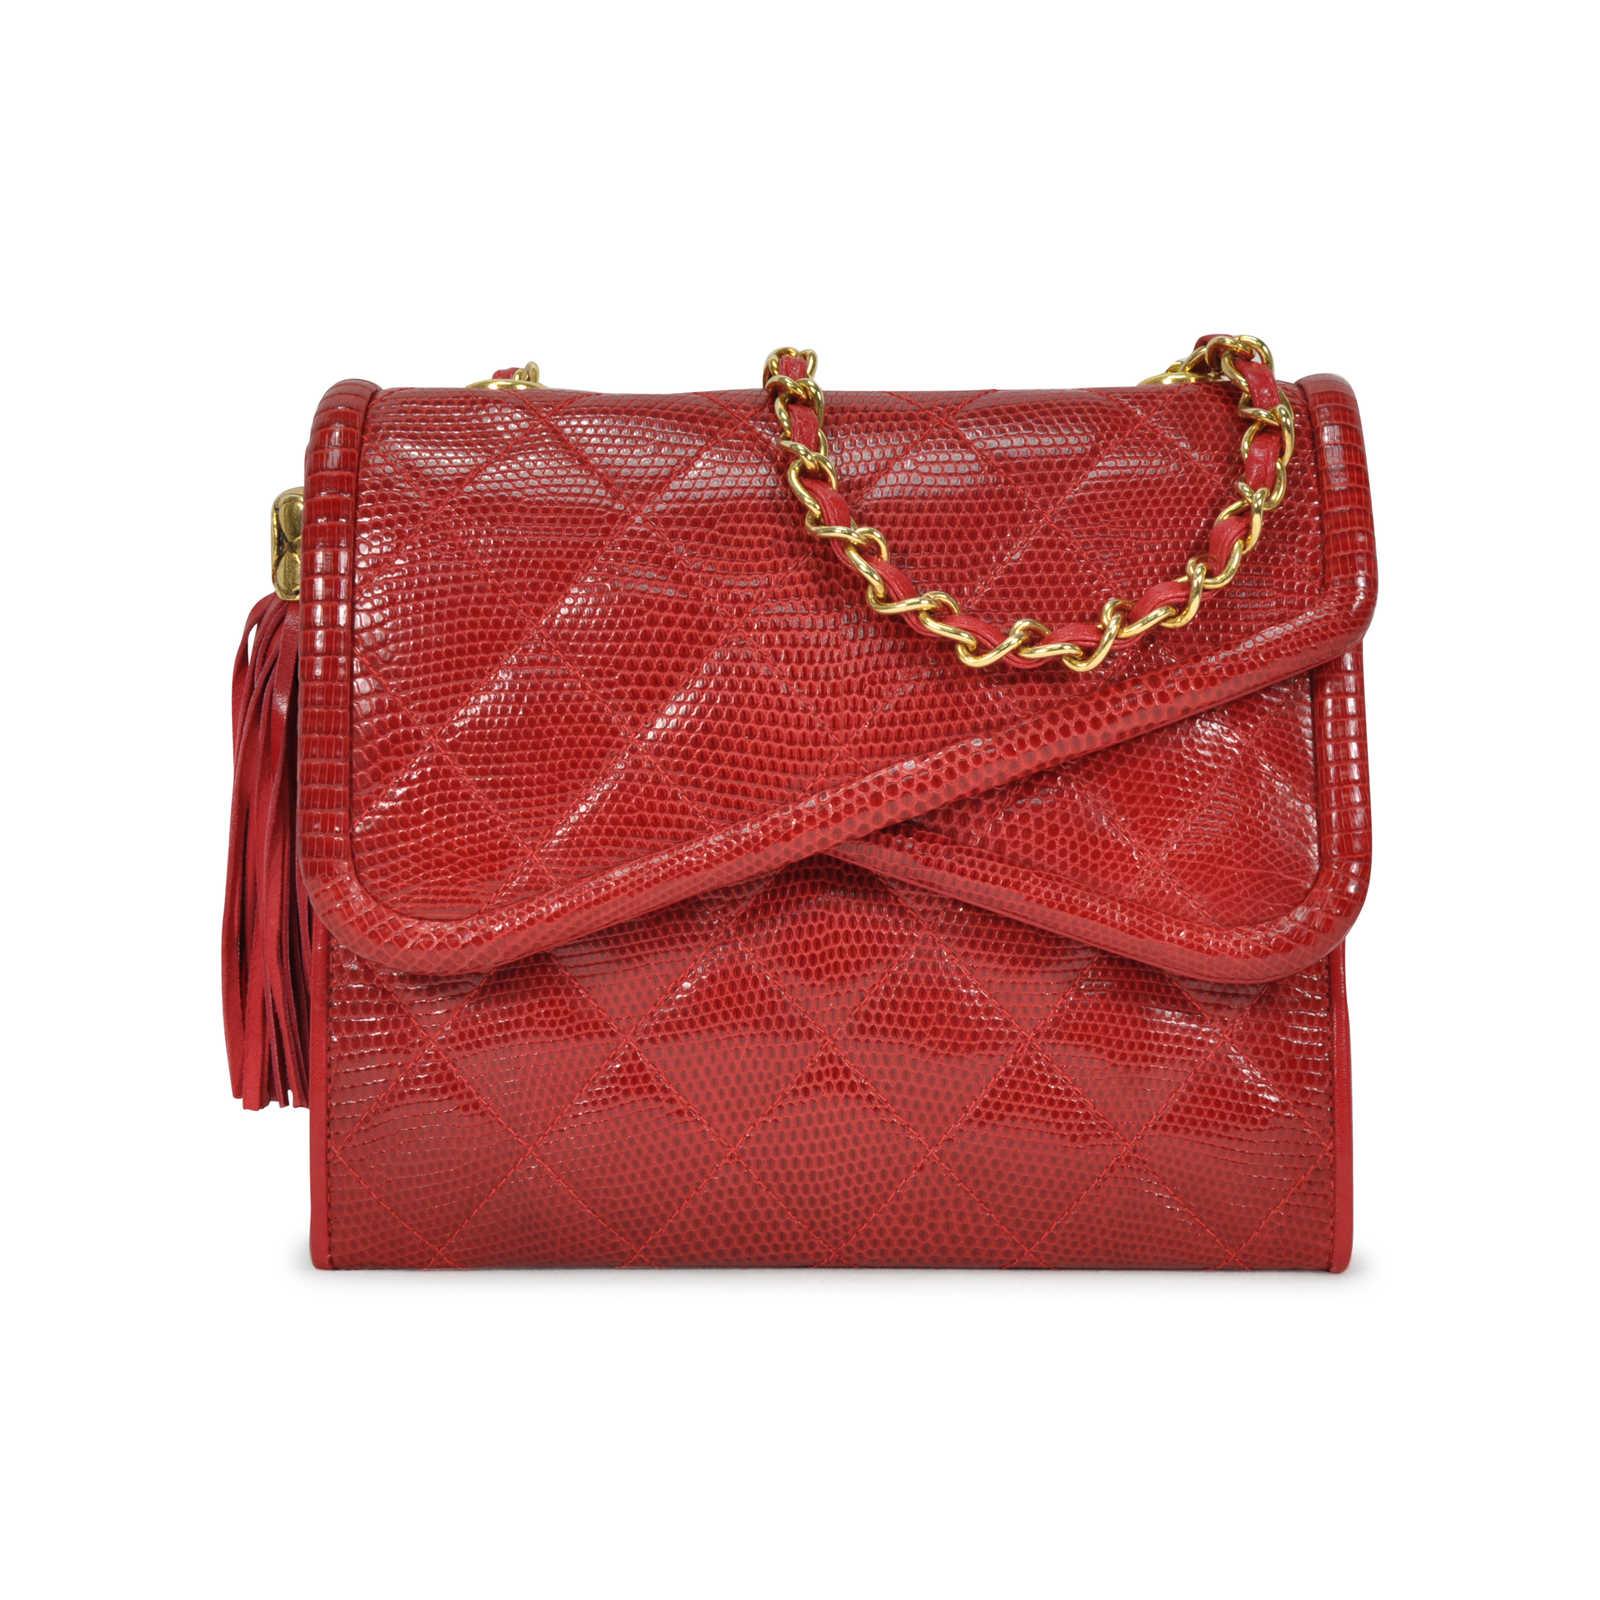 CHANEL - Lizard Quilt Mini Bag